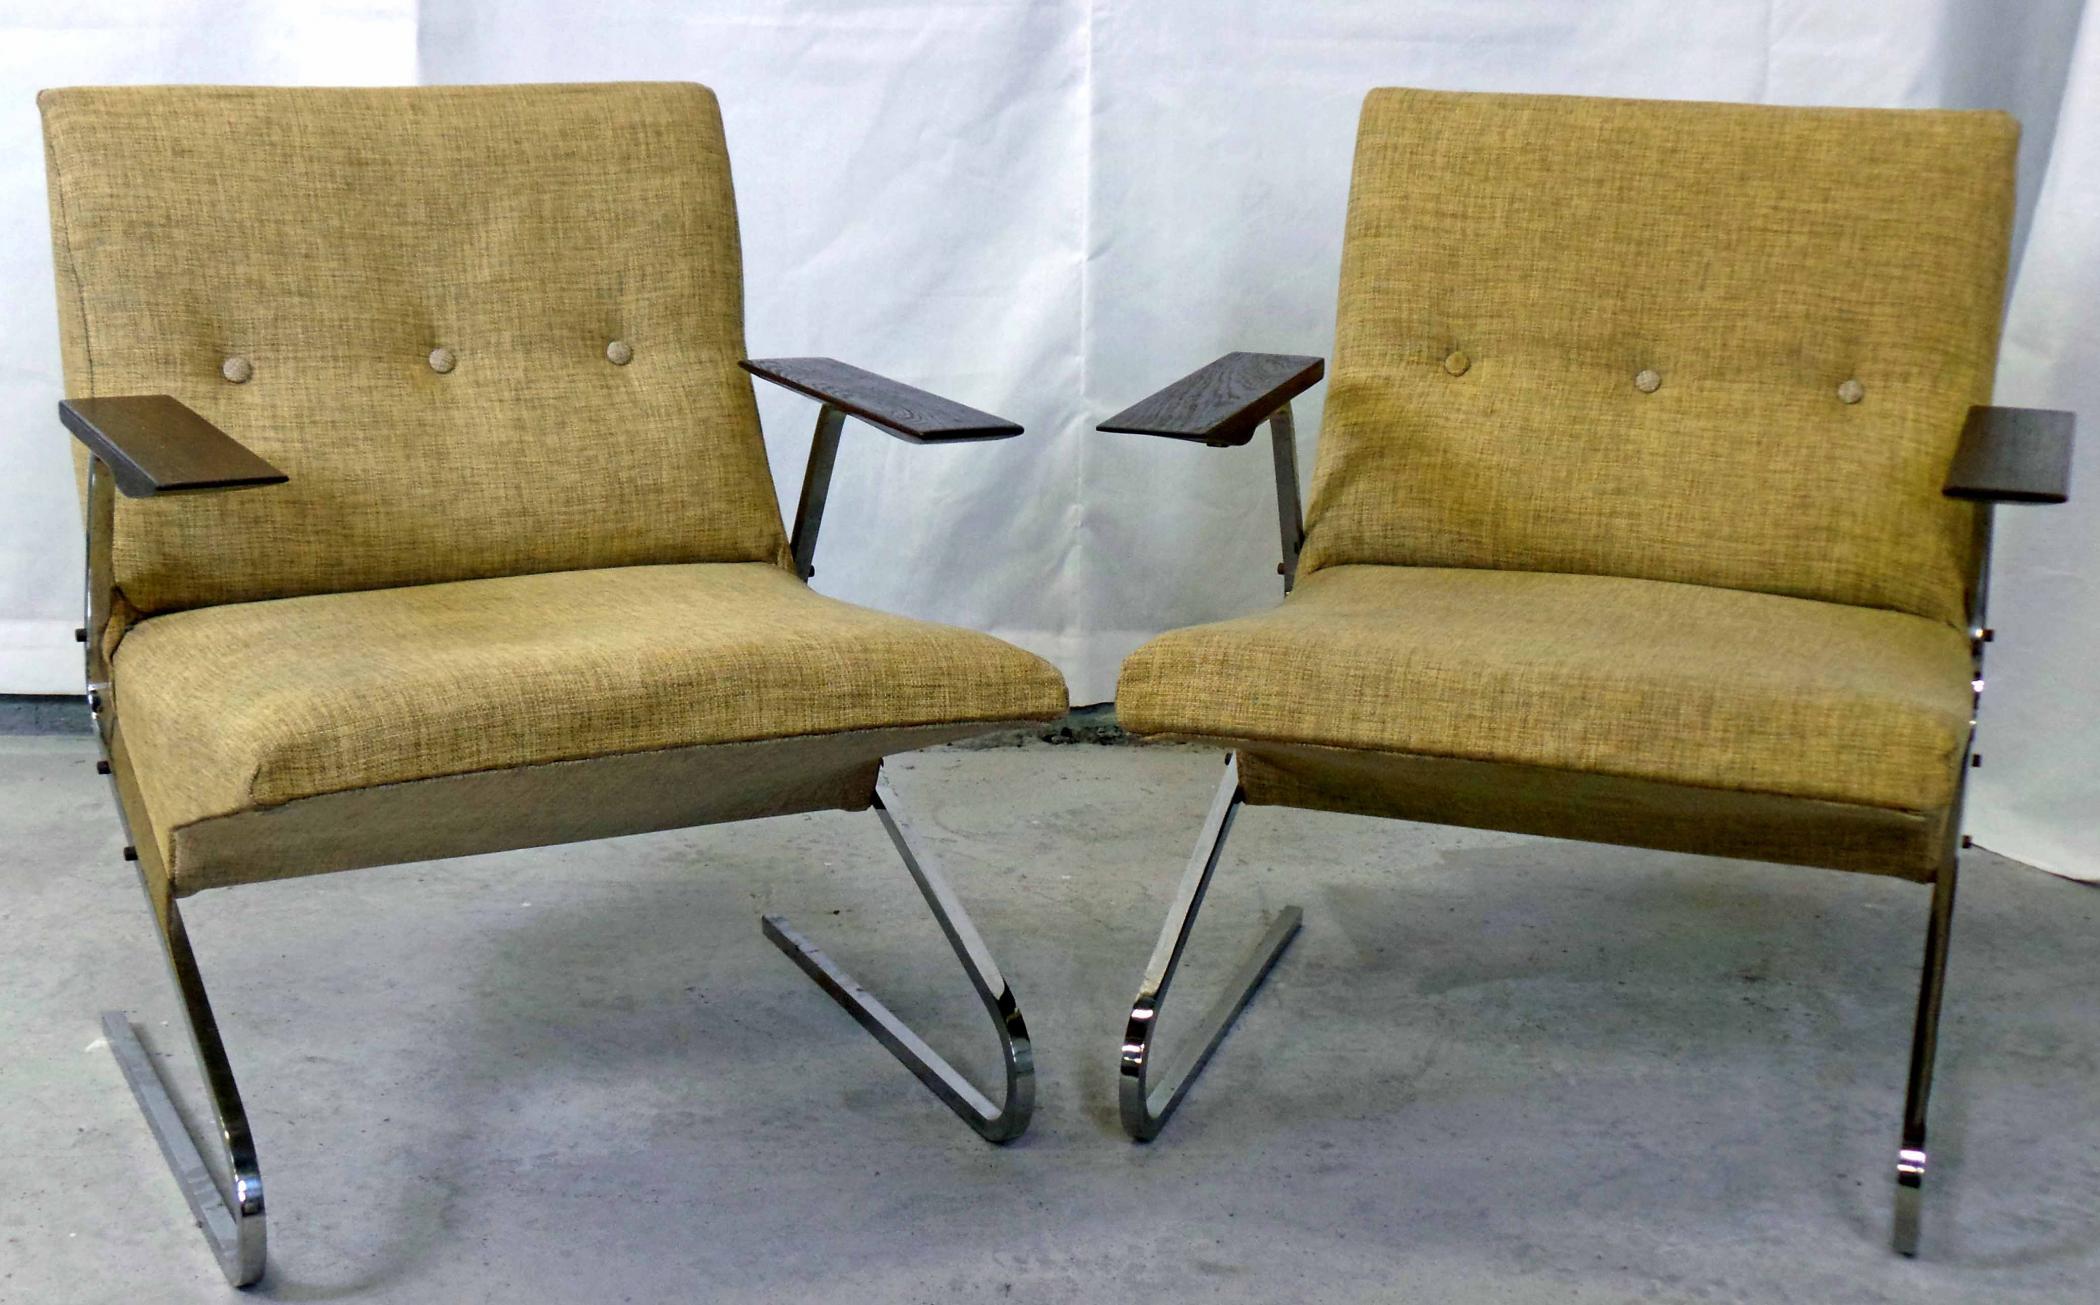 Merveilleux 2 Beaufort Cantilever Lounge Chairs By Van Rijk For Beaufort